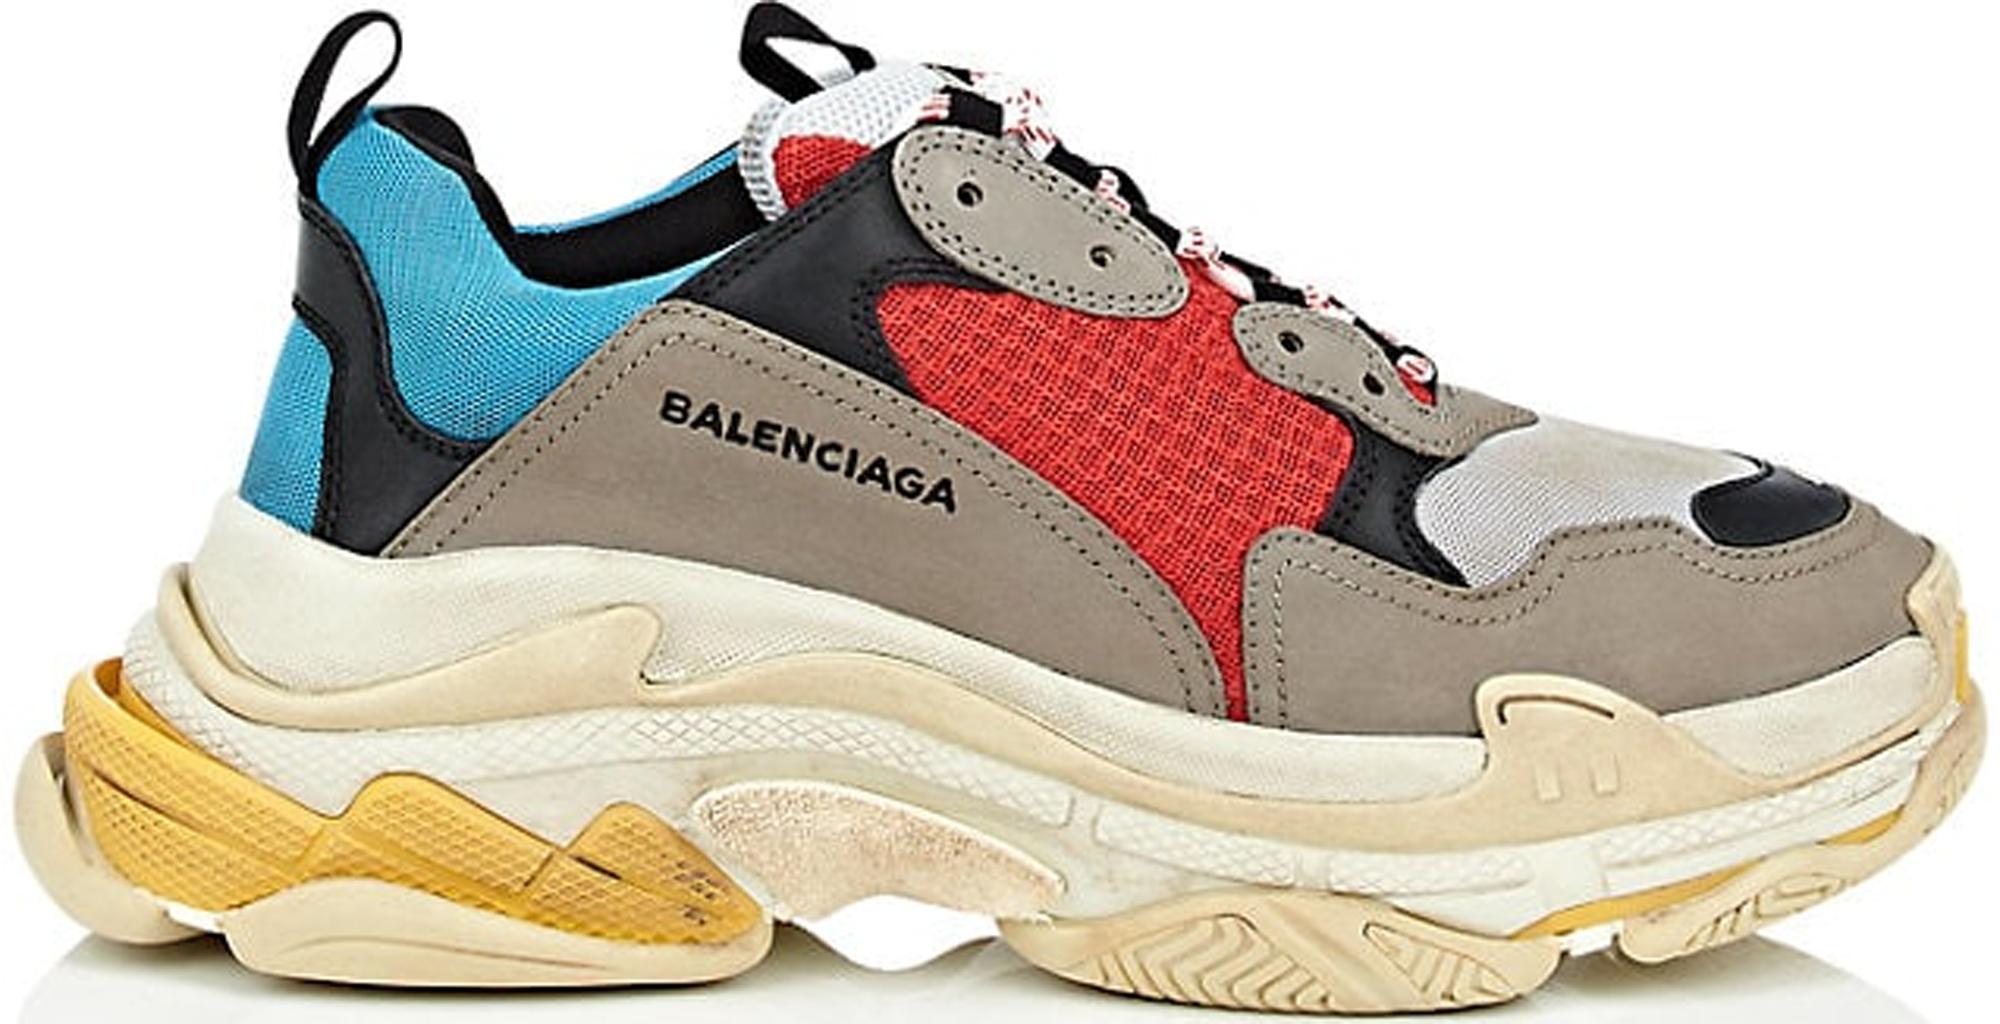 Balenciaga Triple S Taupe Multi - Sneakers